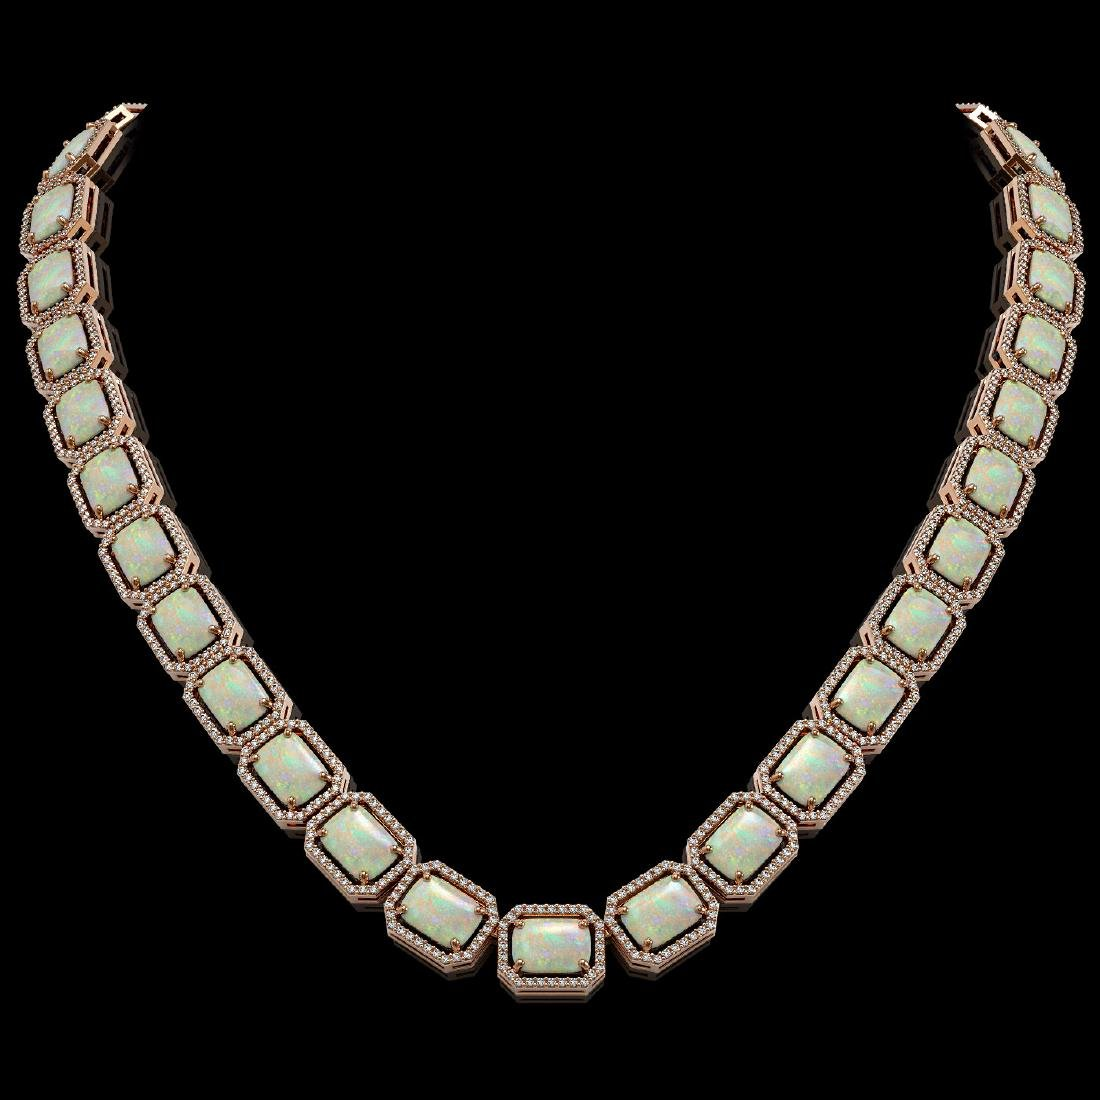 53.59 CTW Opal & Diamond Halo Necklace 10K Rose Gold